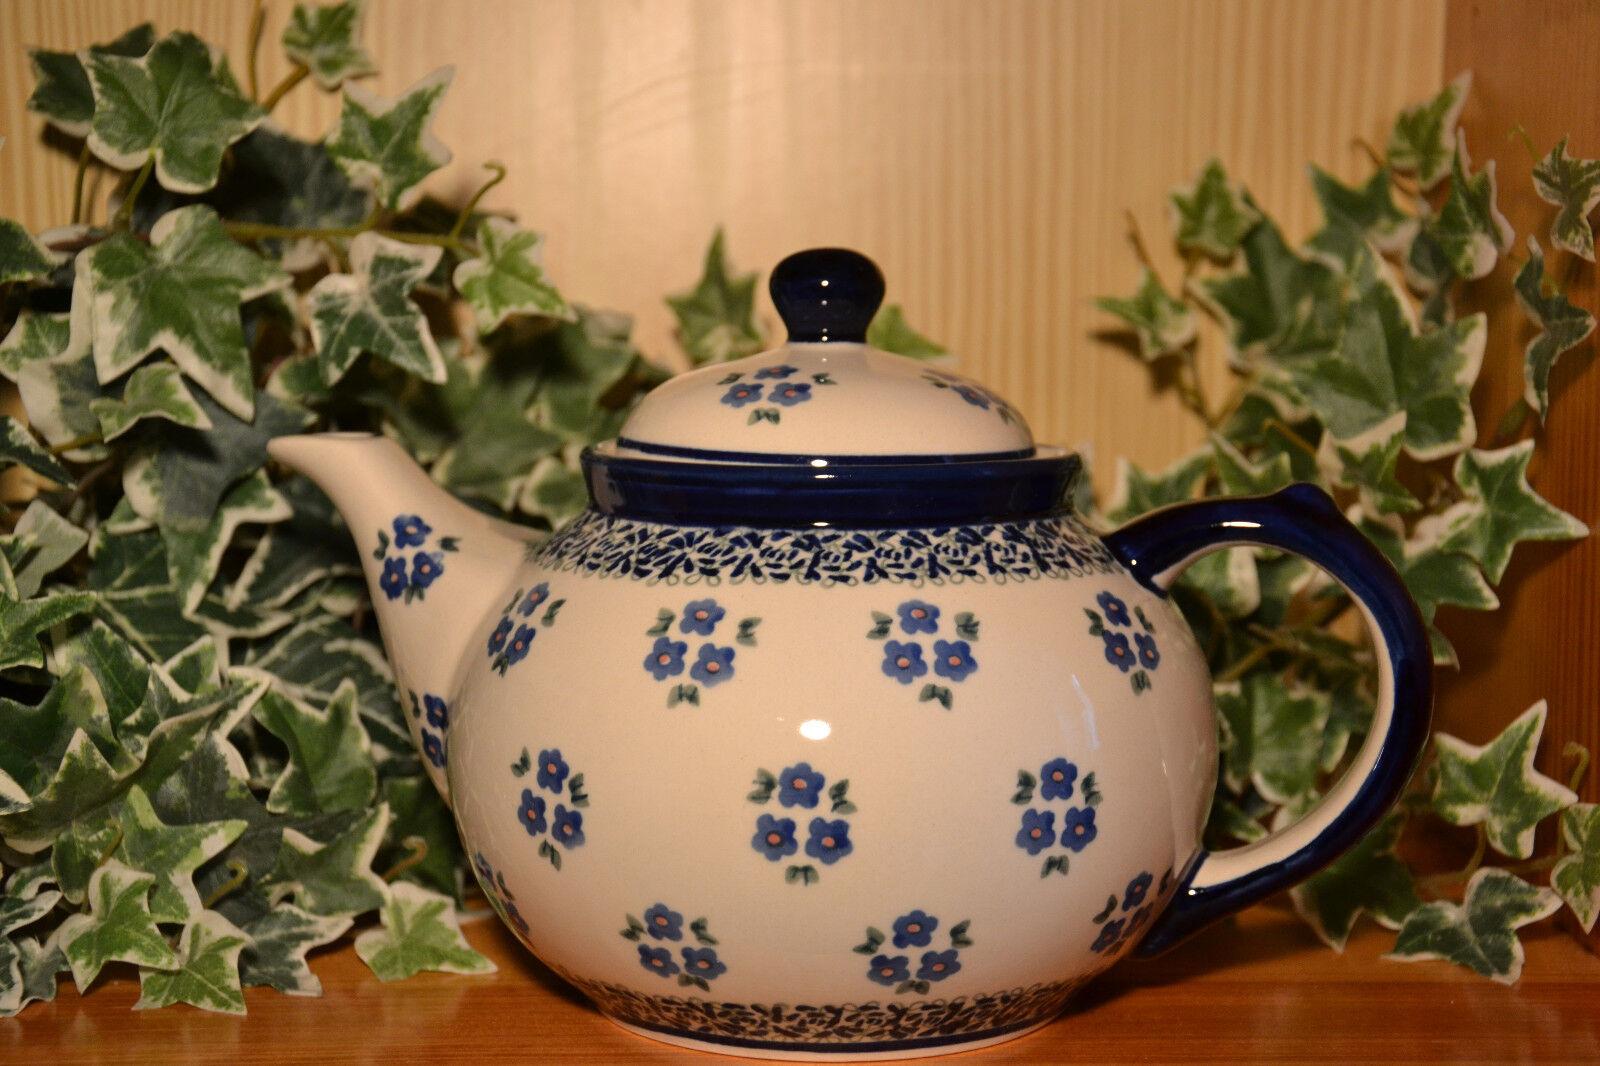 Bunzlauer Keramik Teekanne 1,25 l  Dek. 224a 224a 224a    | Good Design  a8eb07